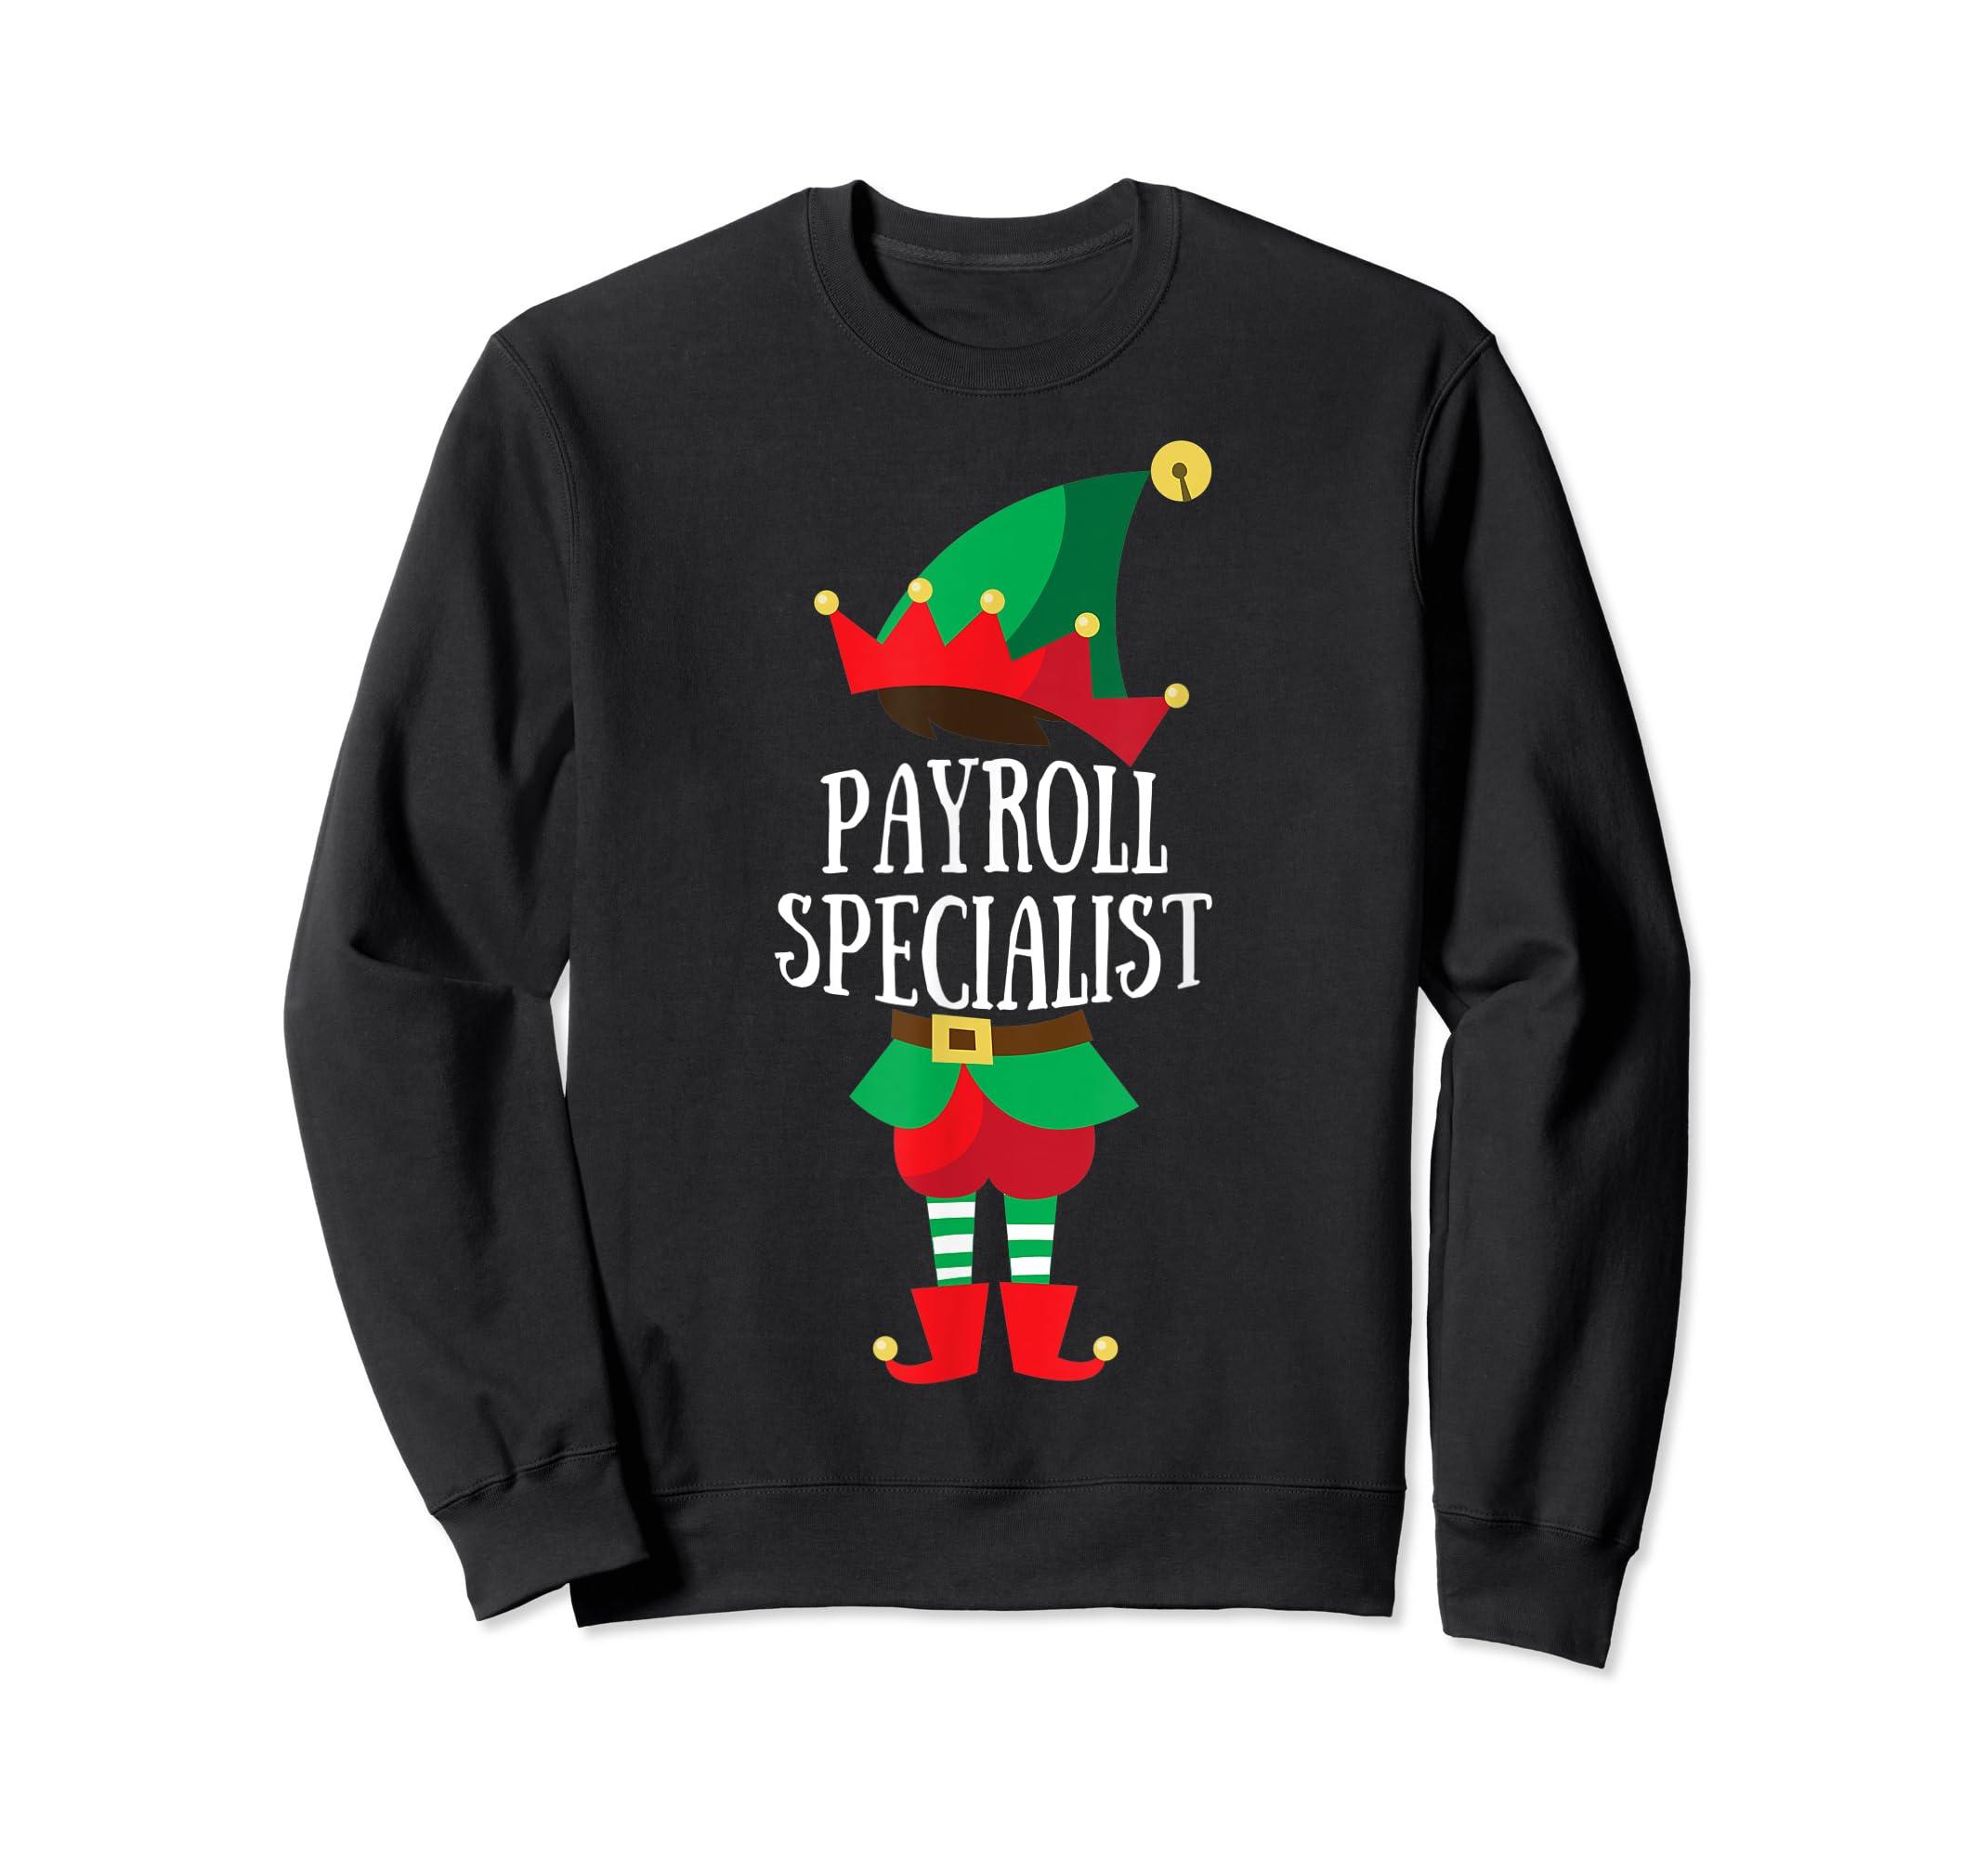 Elf Payroll Specialist Christmas Group Matching T-Shirt-Sweatshirt-Black